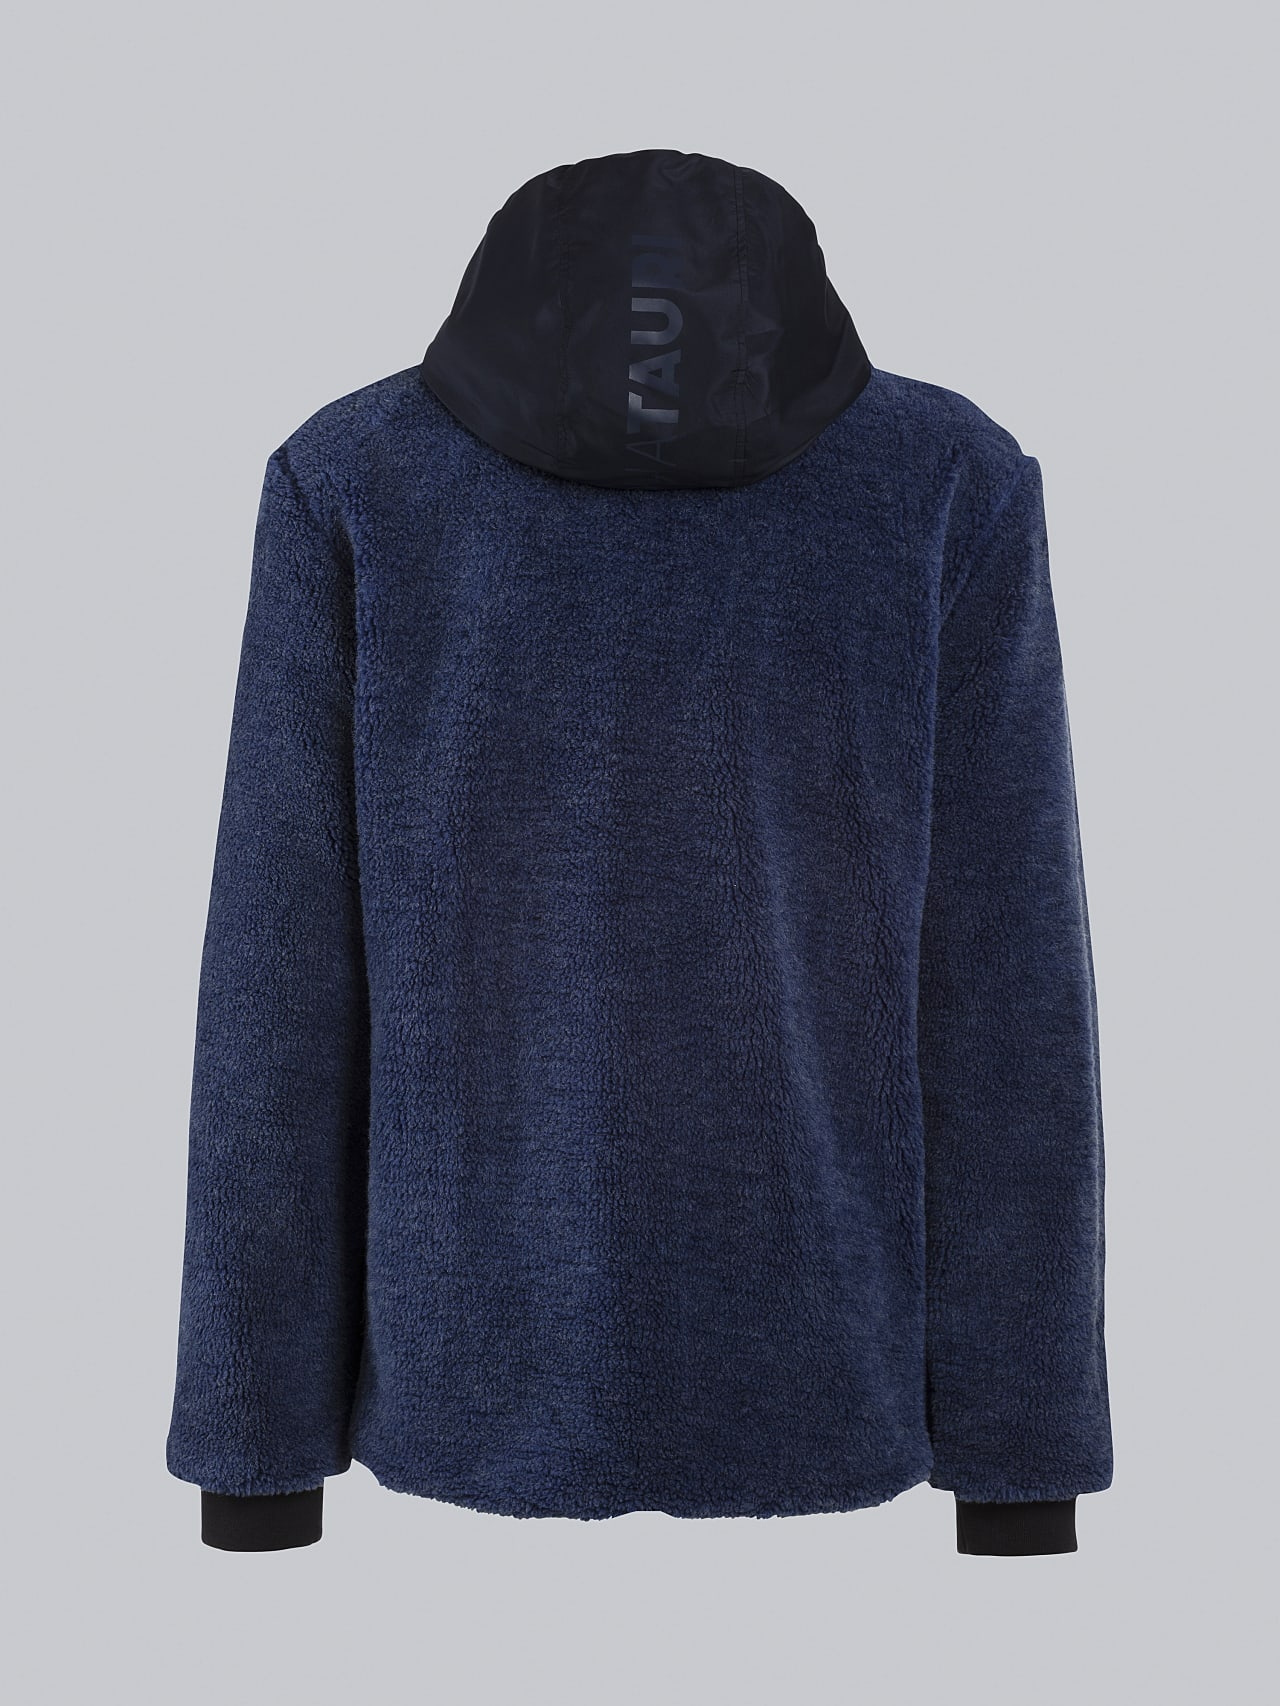 OVEDY V1.Y5.02 Reversible Wool-Blend Teddy Jacket light blue Left Alpha Tauri